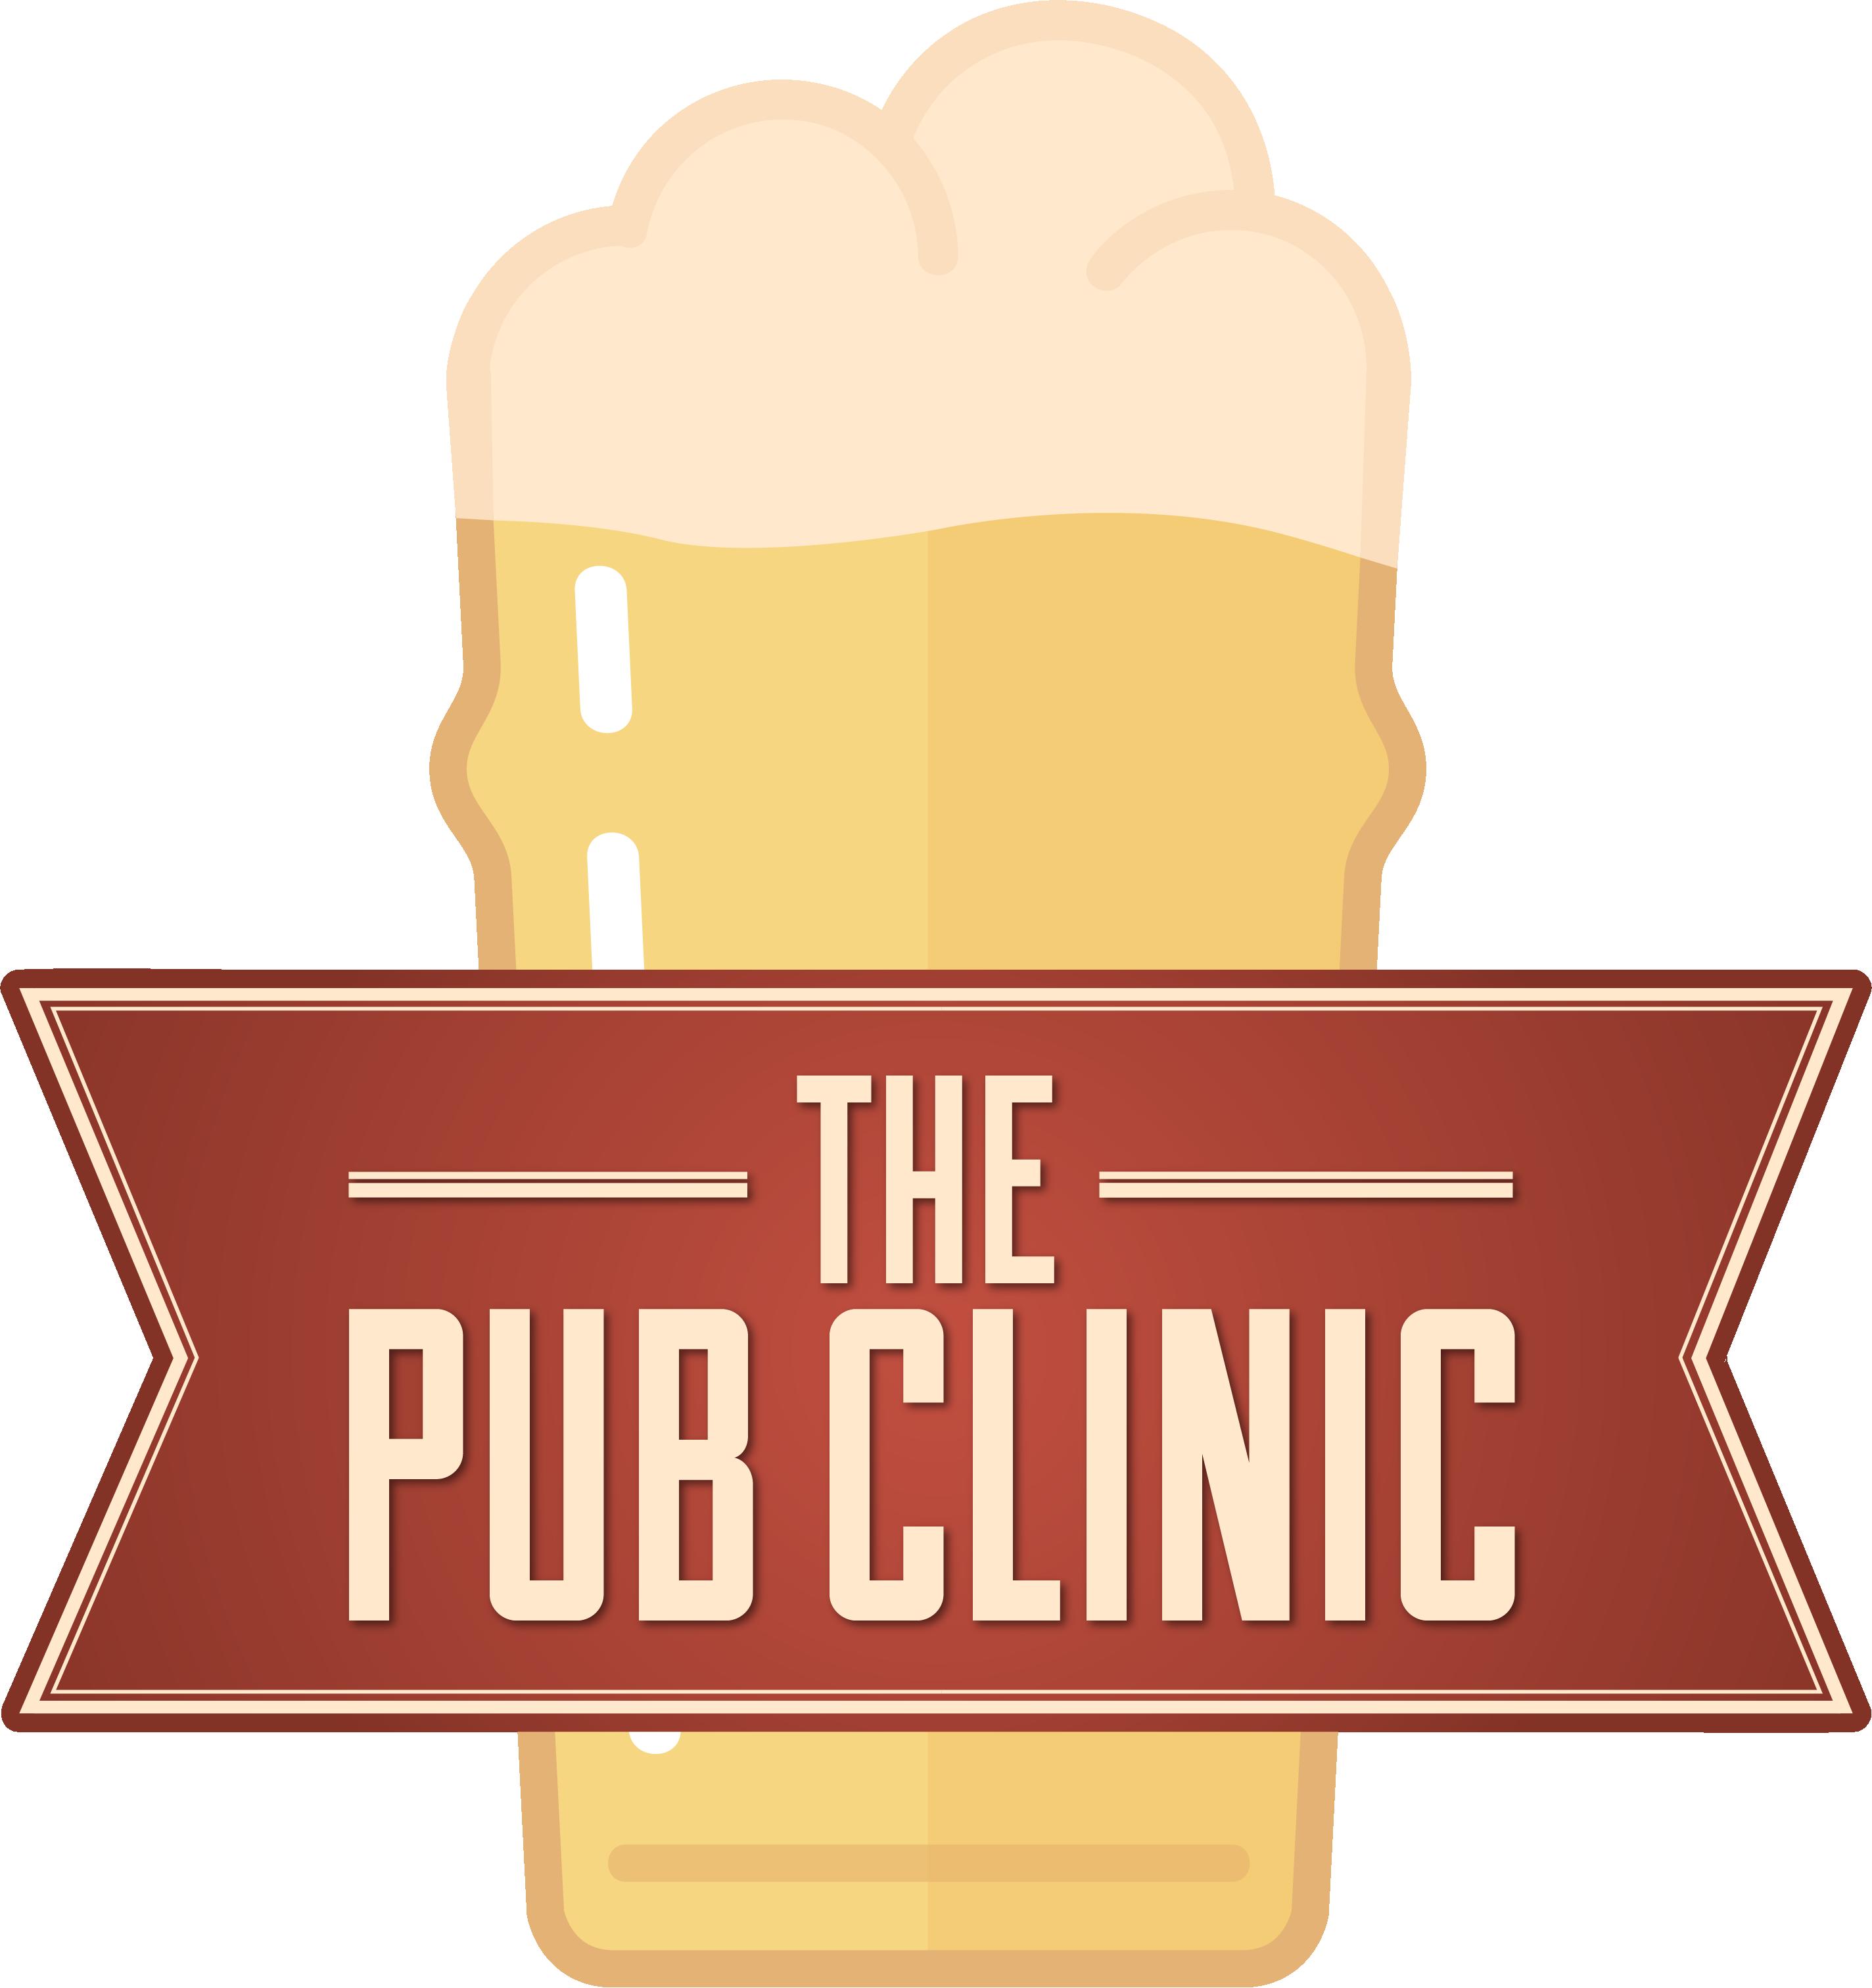 thepubclinic.com.au